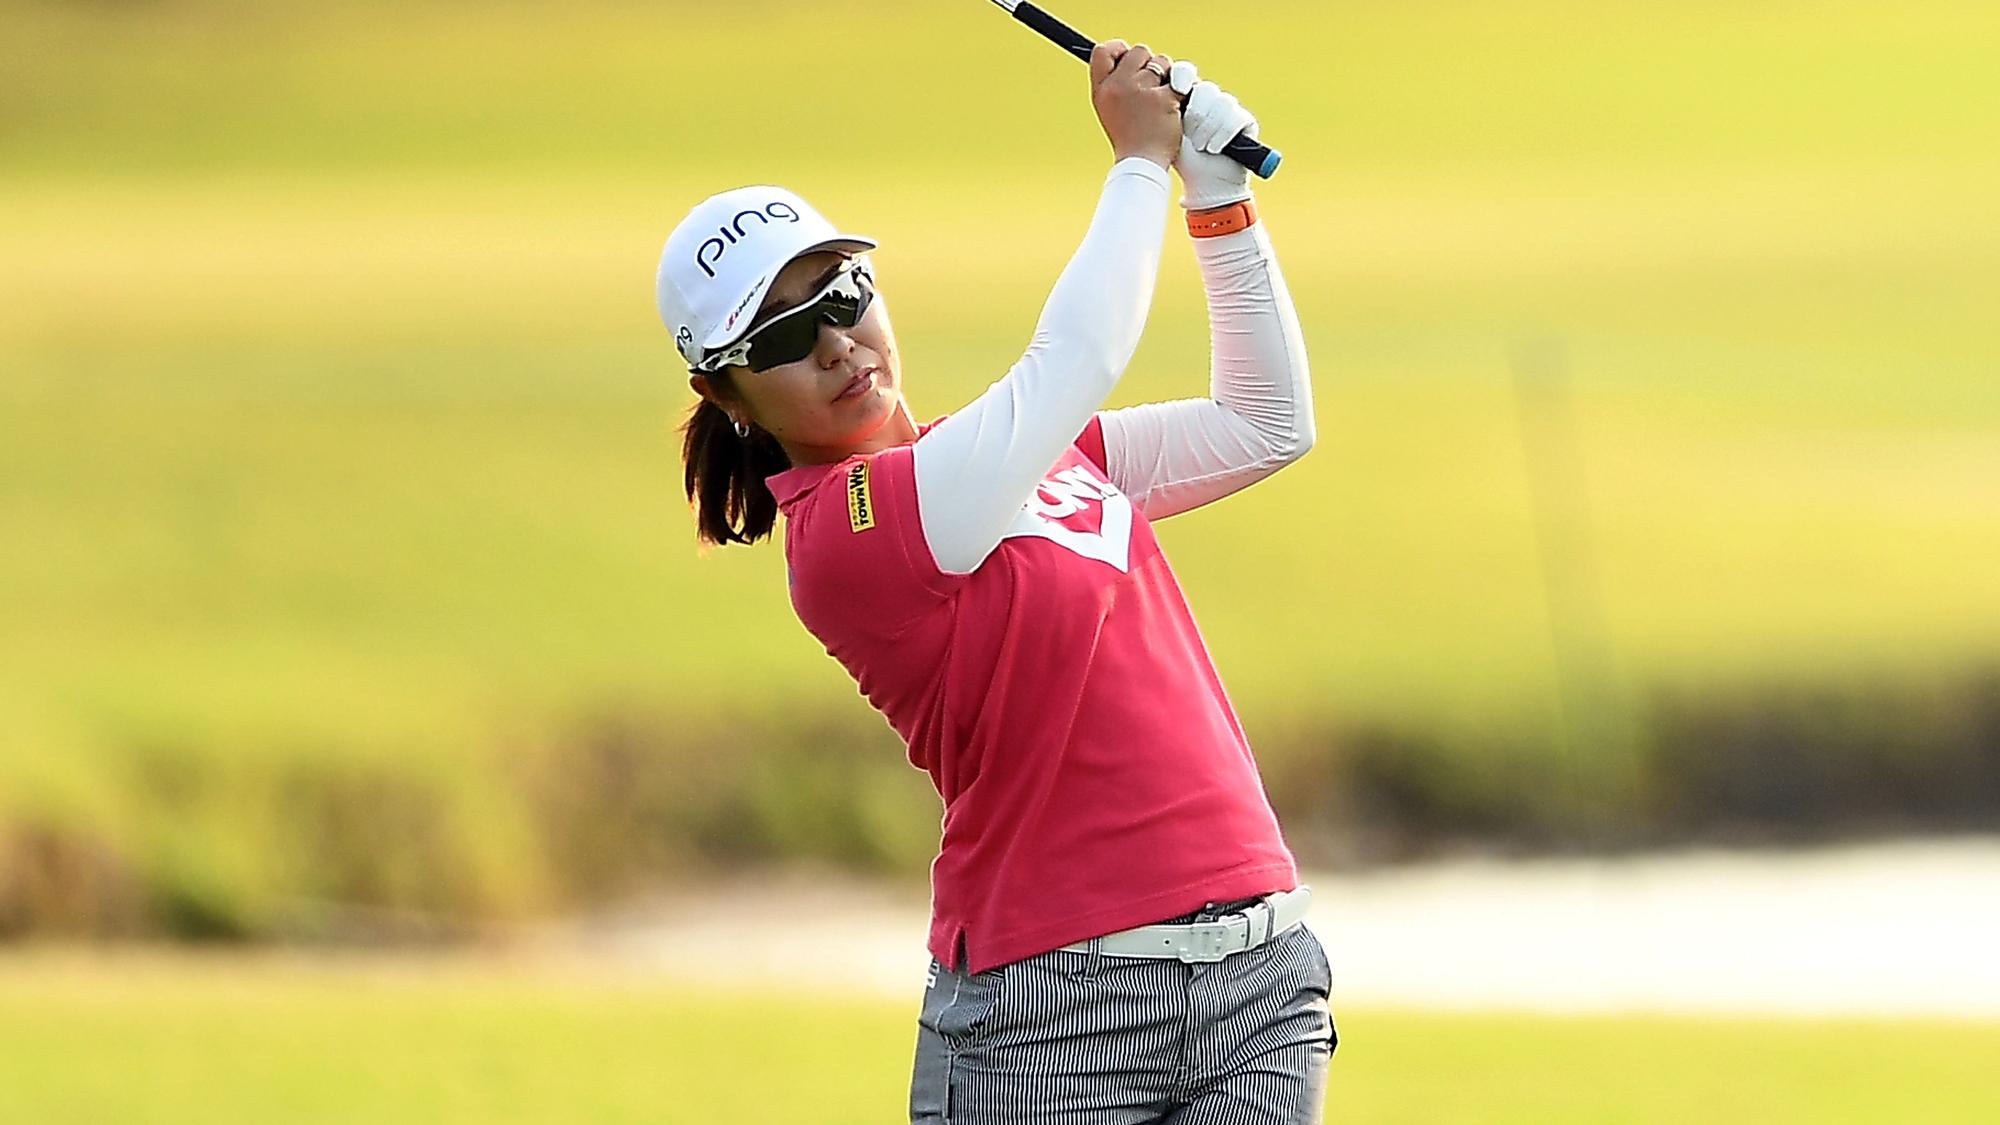 2019 Higa Leads Round One US Womens Open | LPGA | Ladies Professional Golf Association